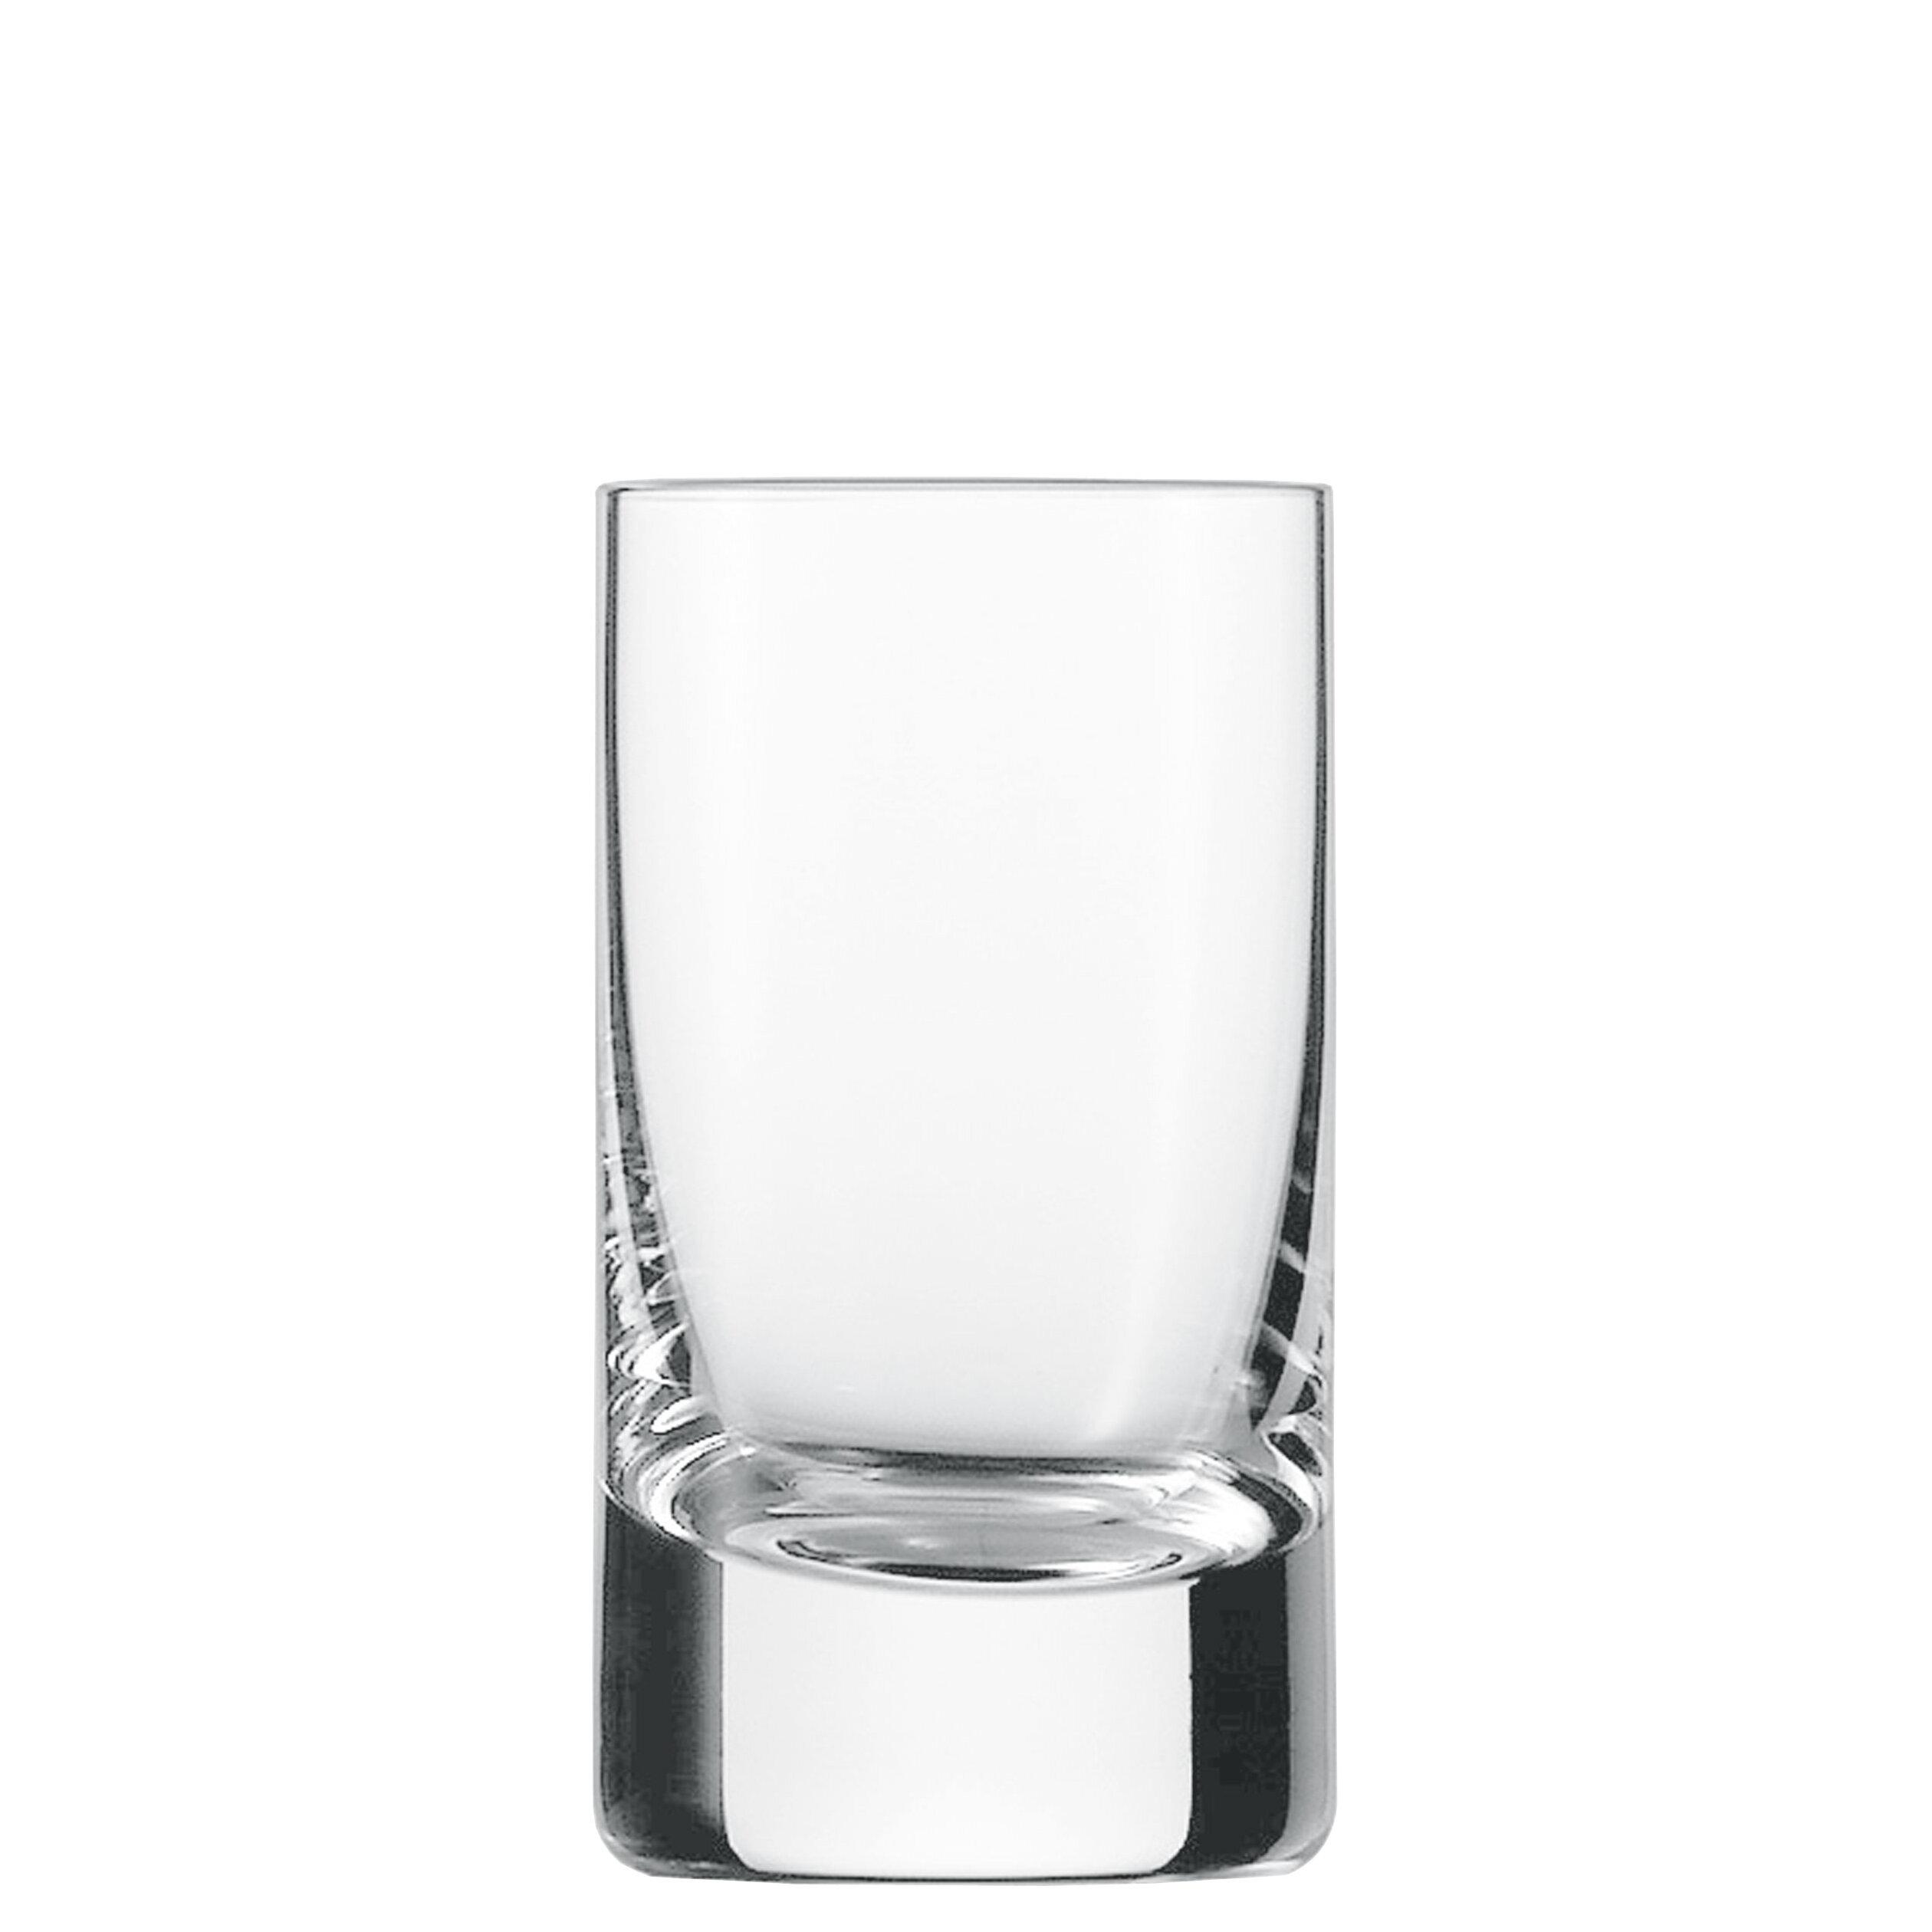 8 pc Shot Glasses Glass Barware Shots drink Tequilla Restaurant Supply 1.5 oz